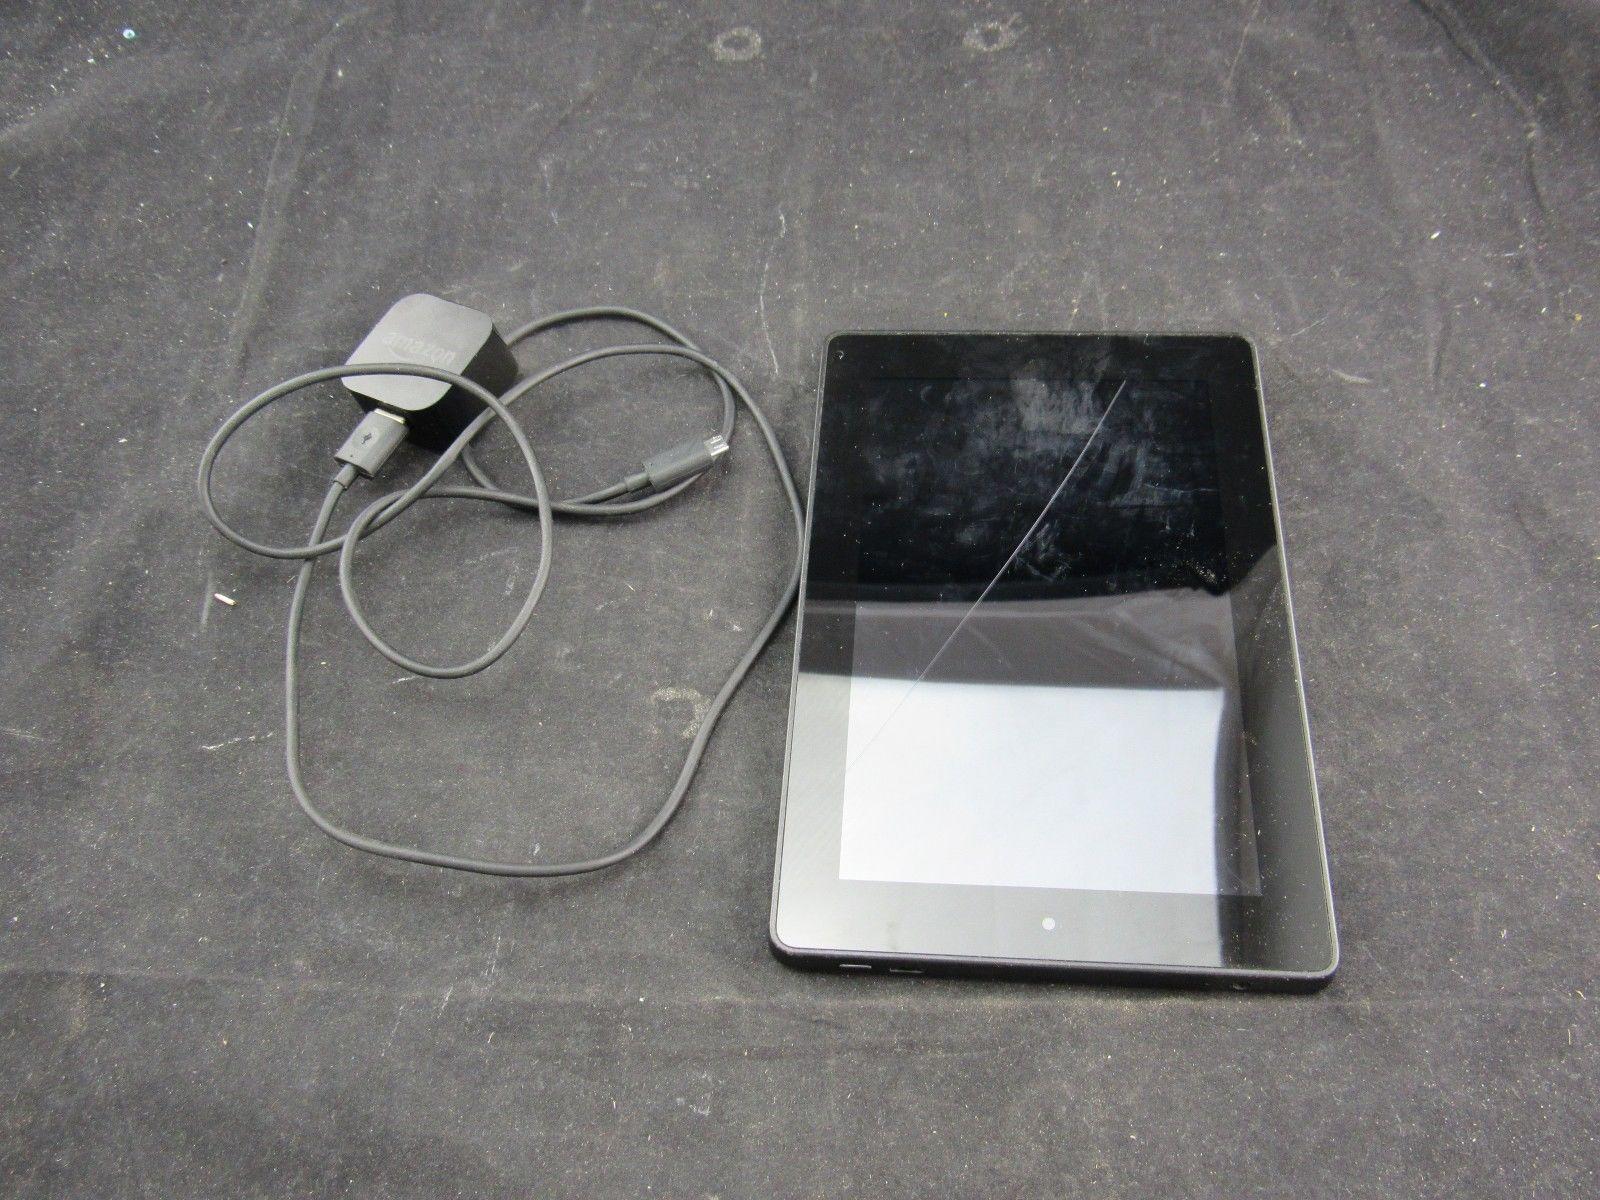 Amazon Kindle Fire HD7 SQ46CW Tablet Black